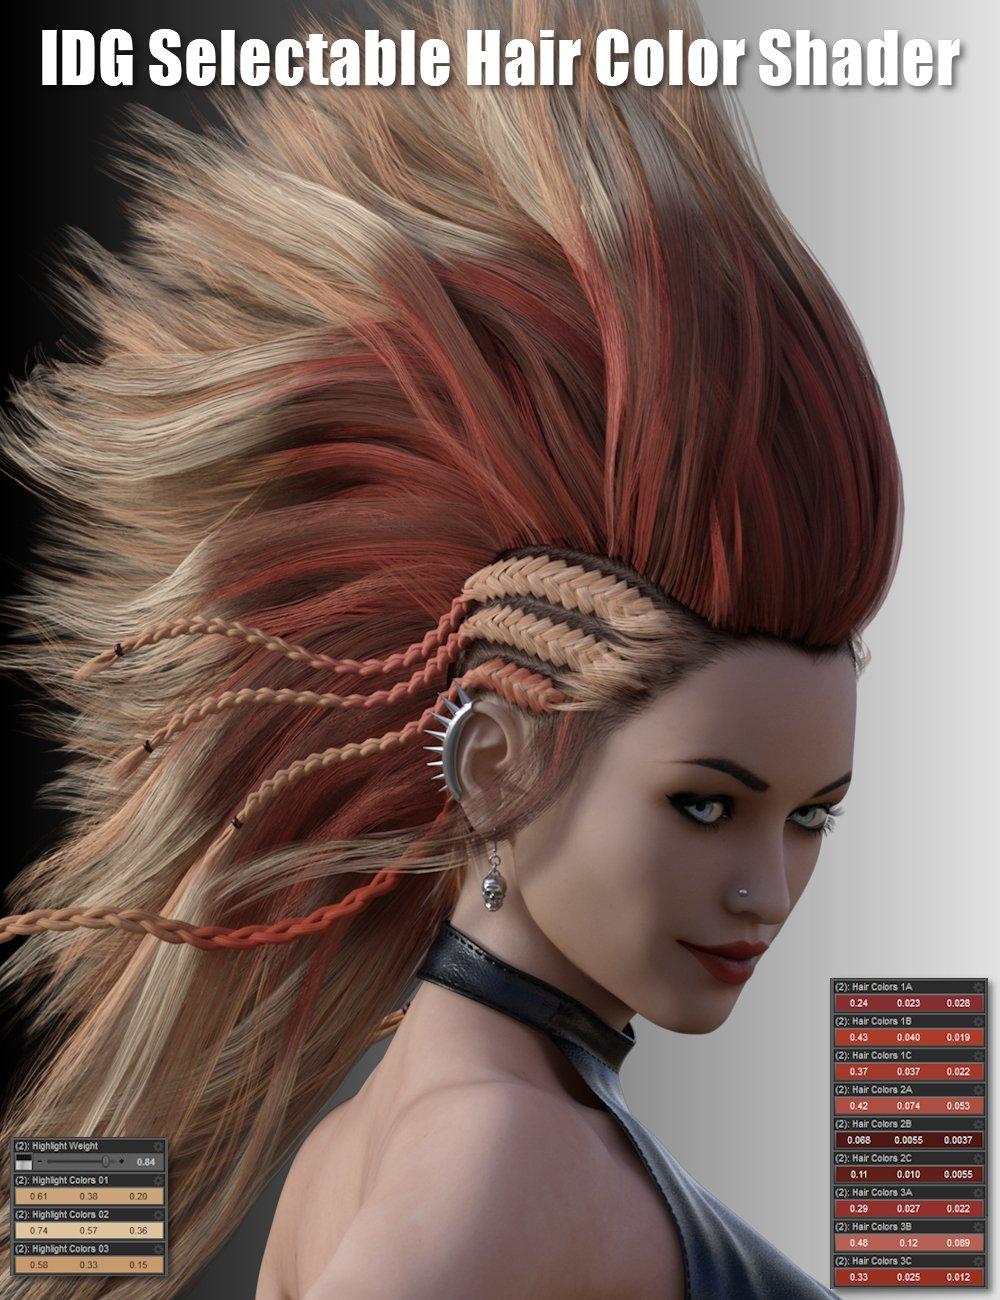 IDG Iray Selectable Hair Color Shader by: IDG DesignsDestinysGardenInaneGlory, 3D Models by Daz 3D